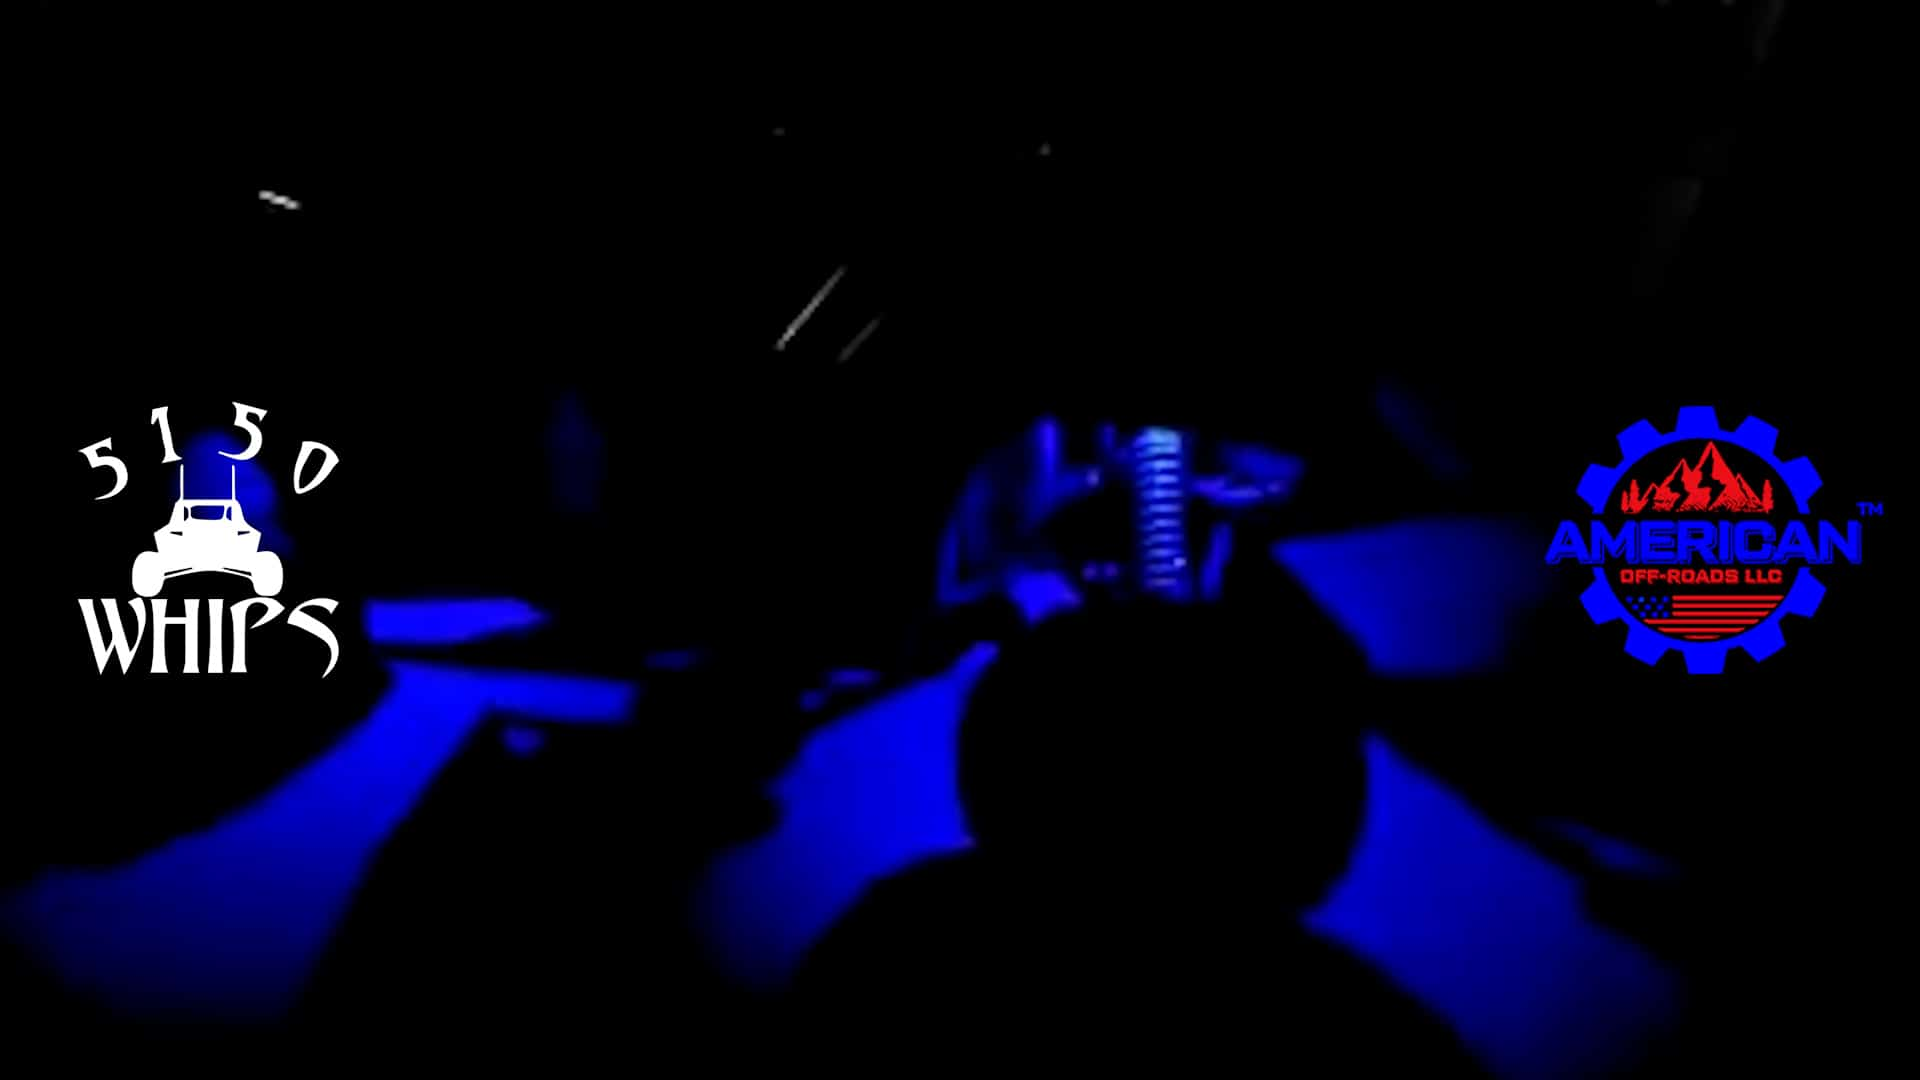 5150 Whips 187 Rock Lights Highlights